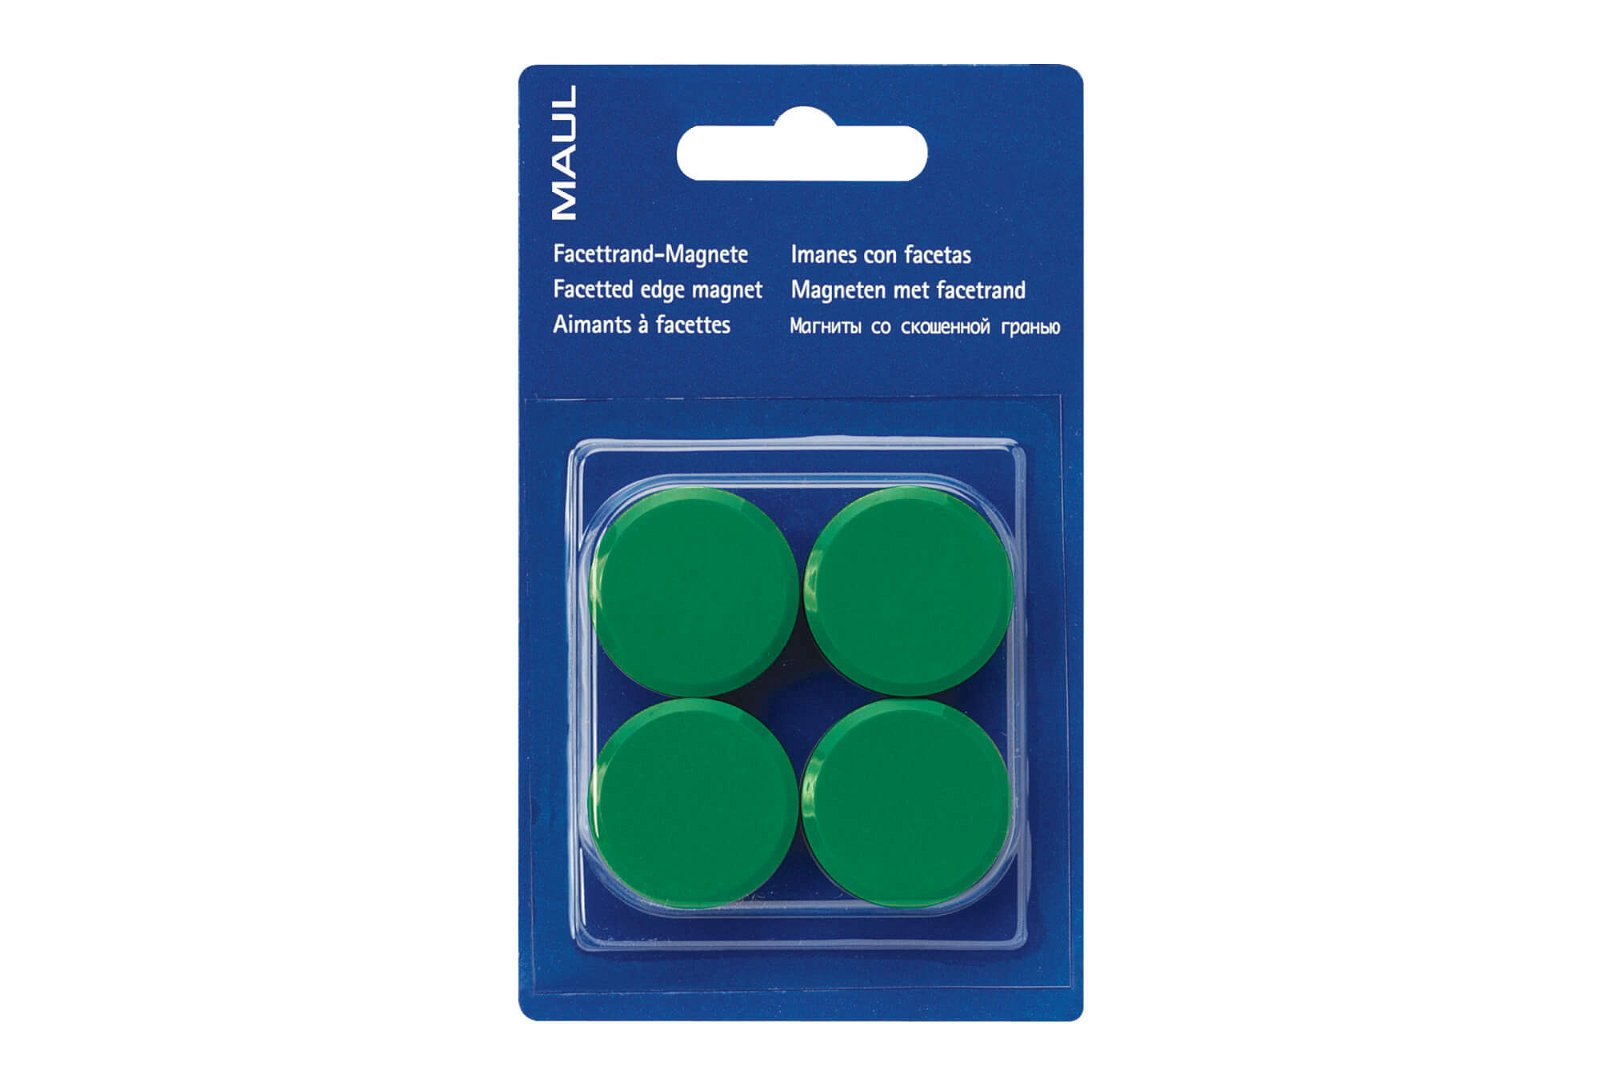 Facetterand-Magnet MAULpro SB Ø 30 mm, 0,6 kg, 4 St./Set, grün